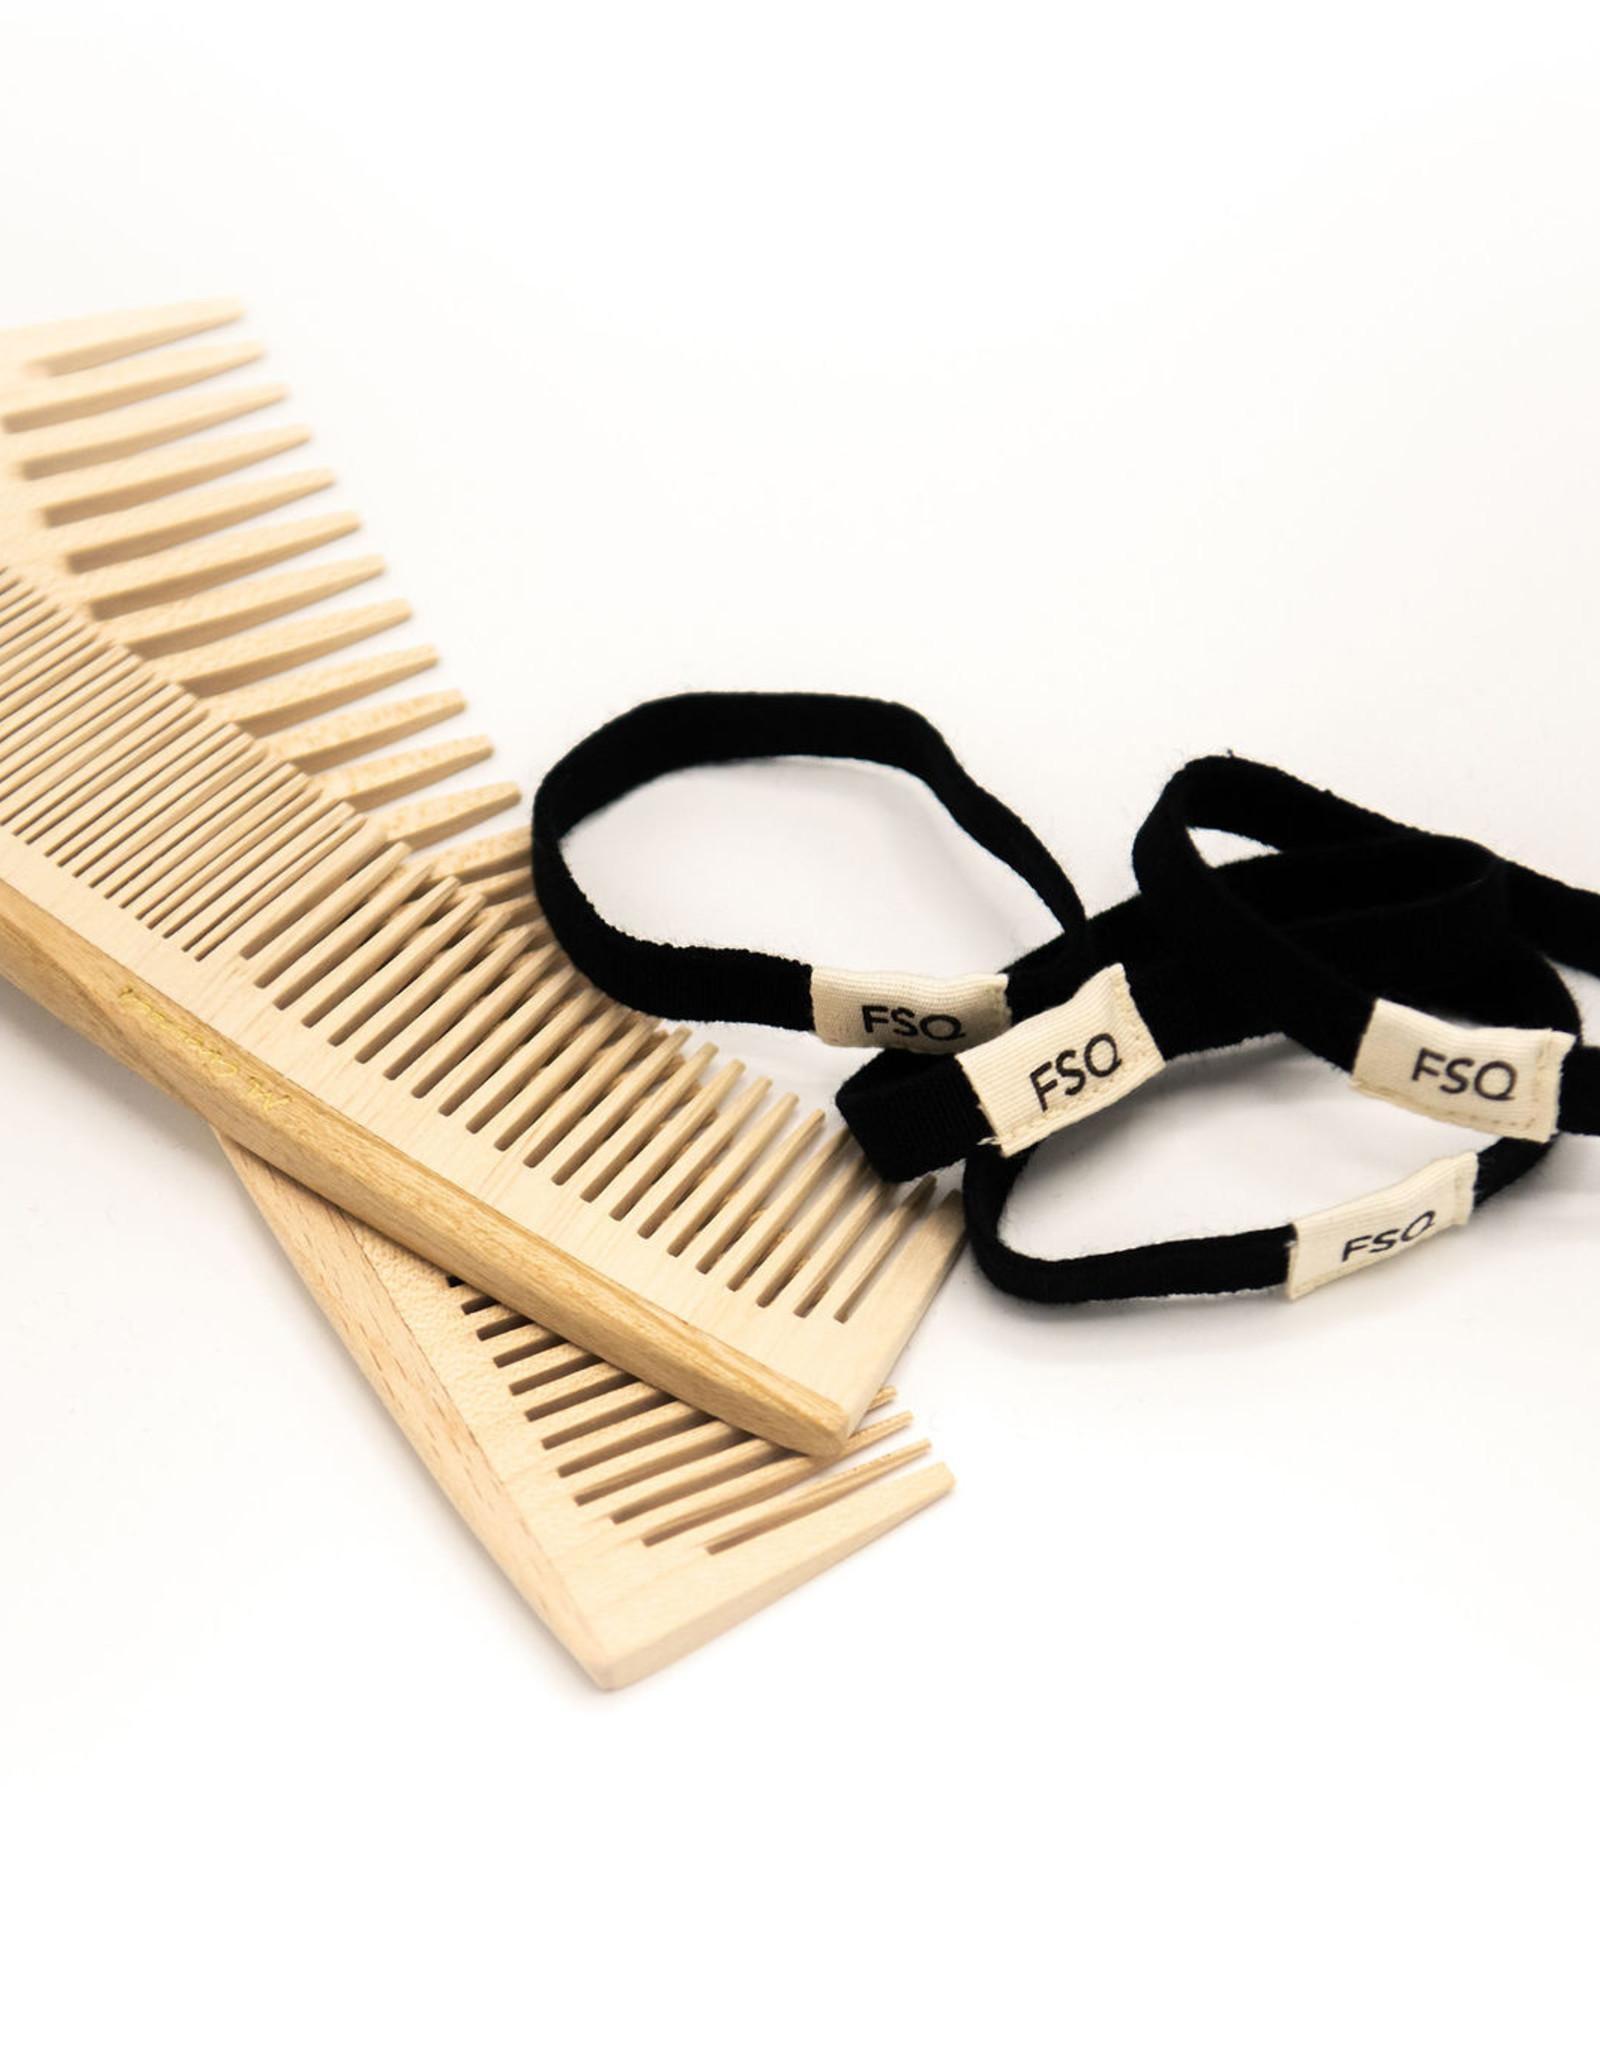 Fairsquared Hair ties per piece